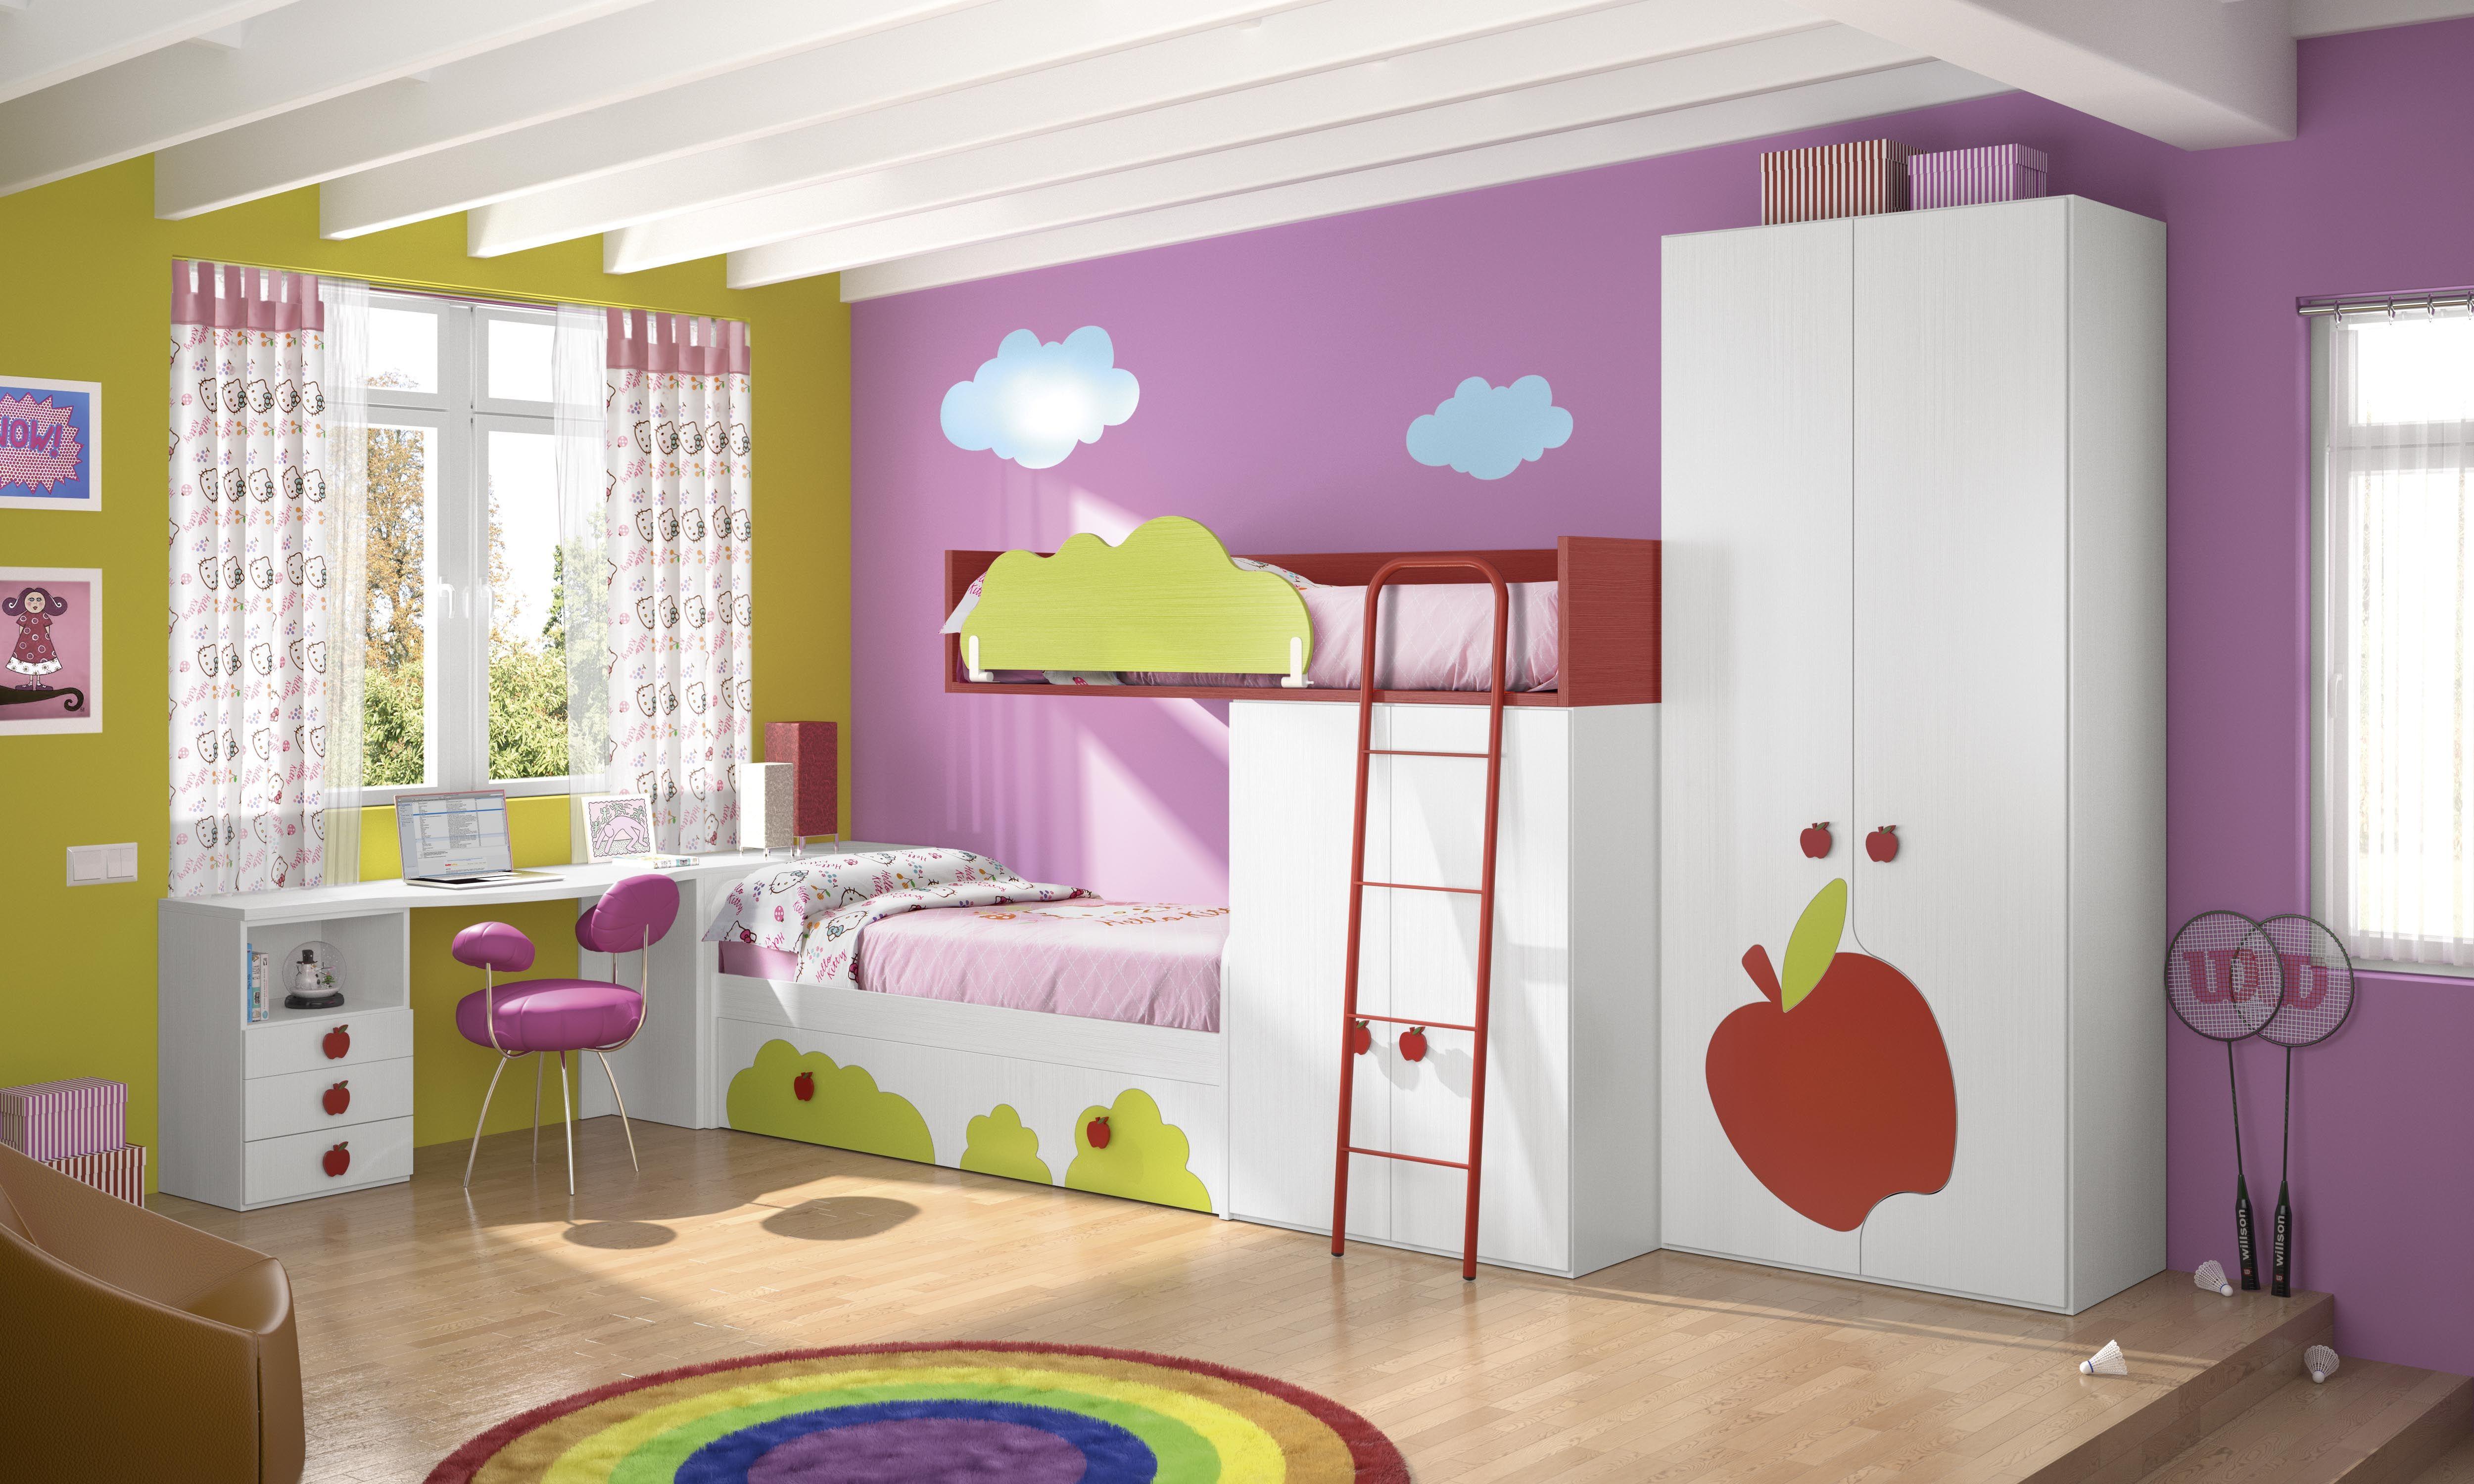 Habitaciones infantiles tem ticas paisajes dibujos animados hk5 paisajes landscapes - Habitaciones infantiles tematicas ...